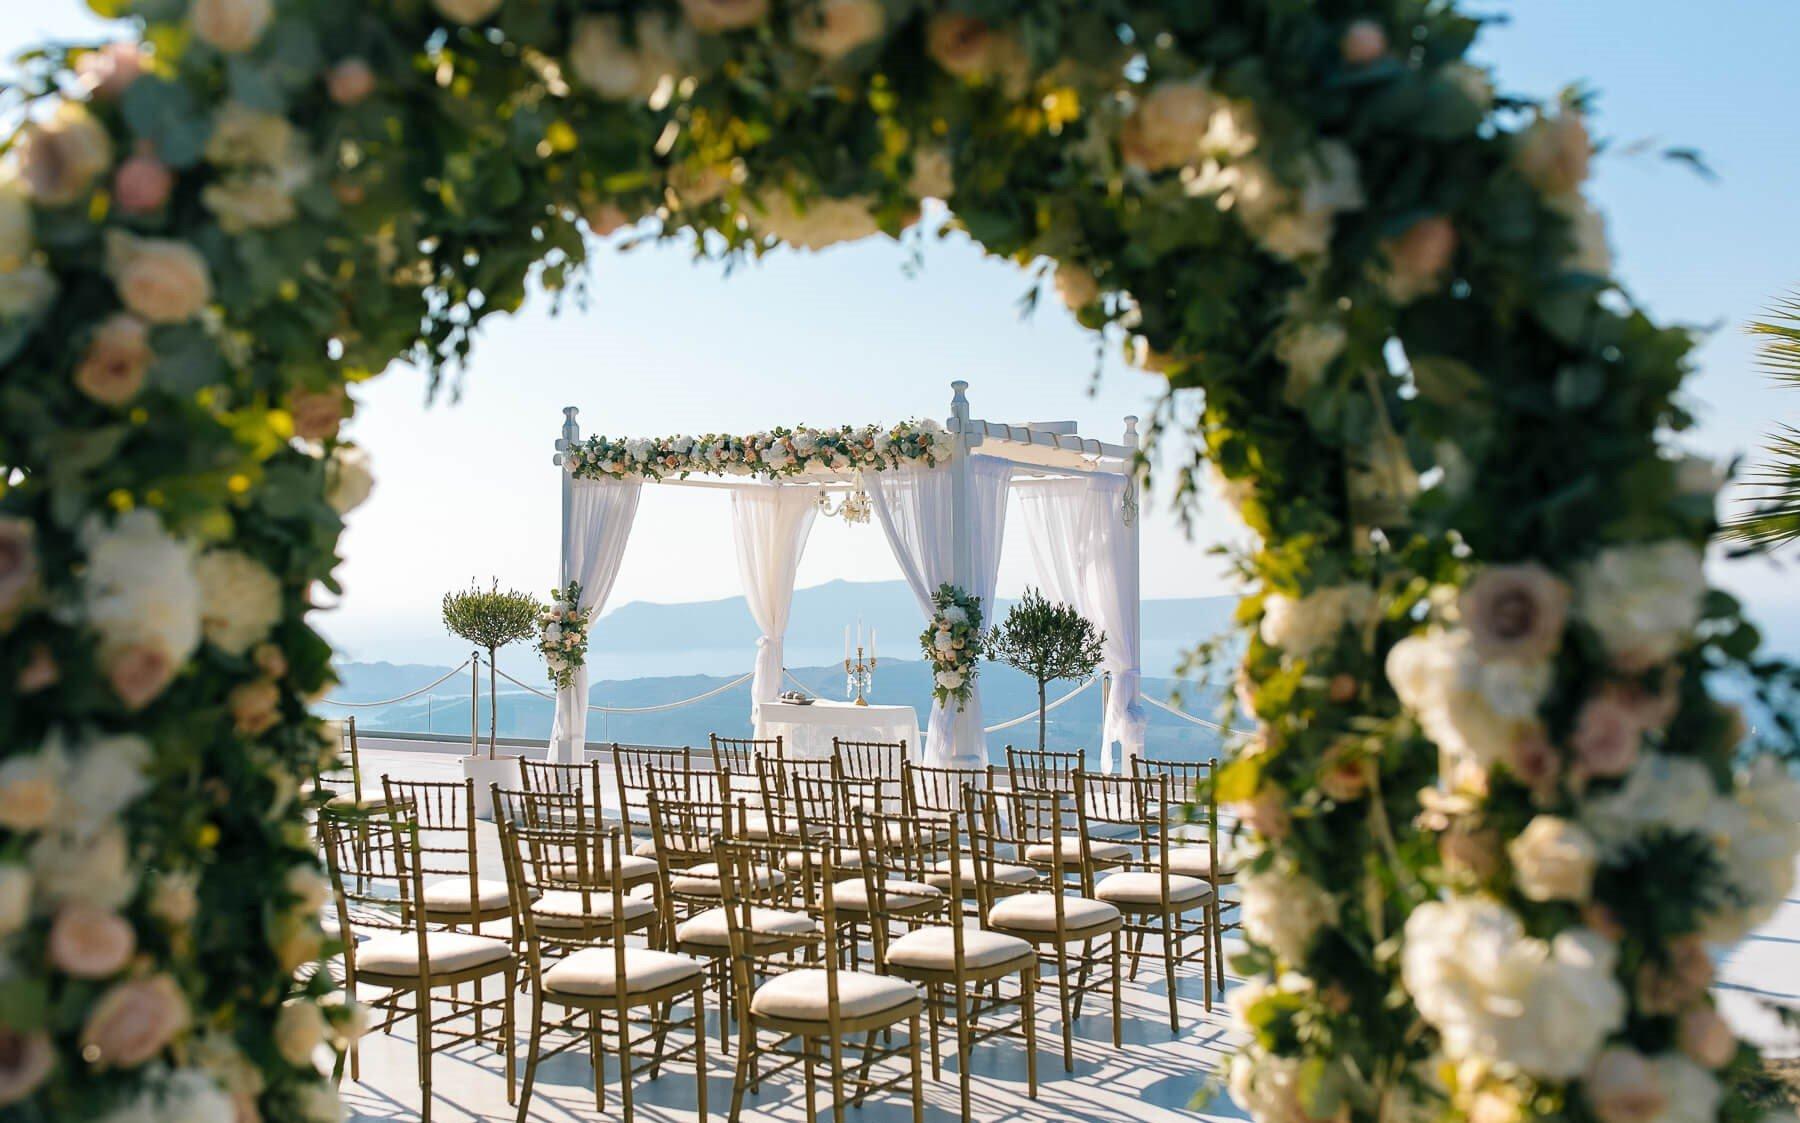 santorini gem wedding location 5